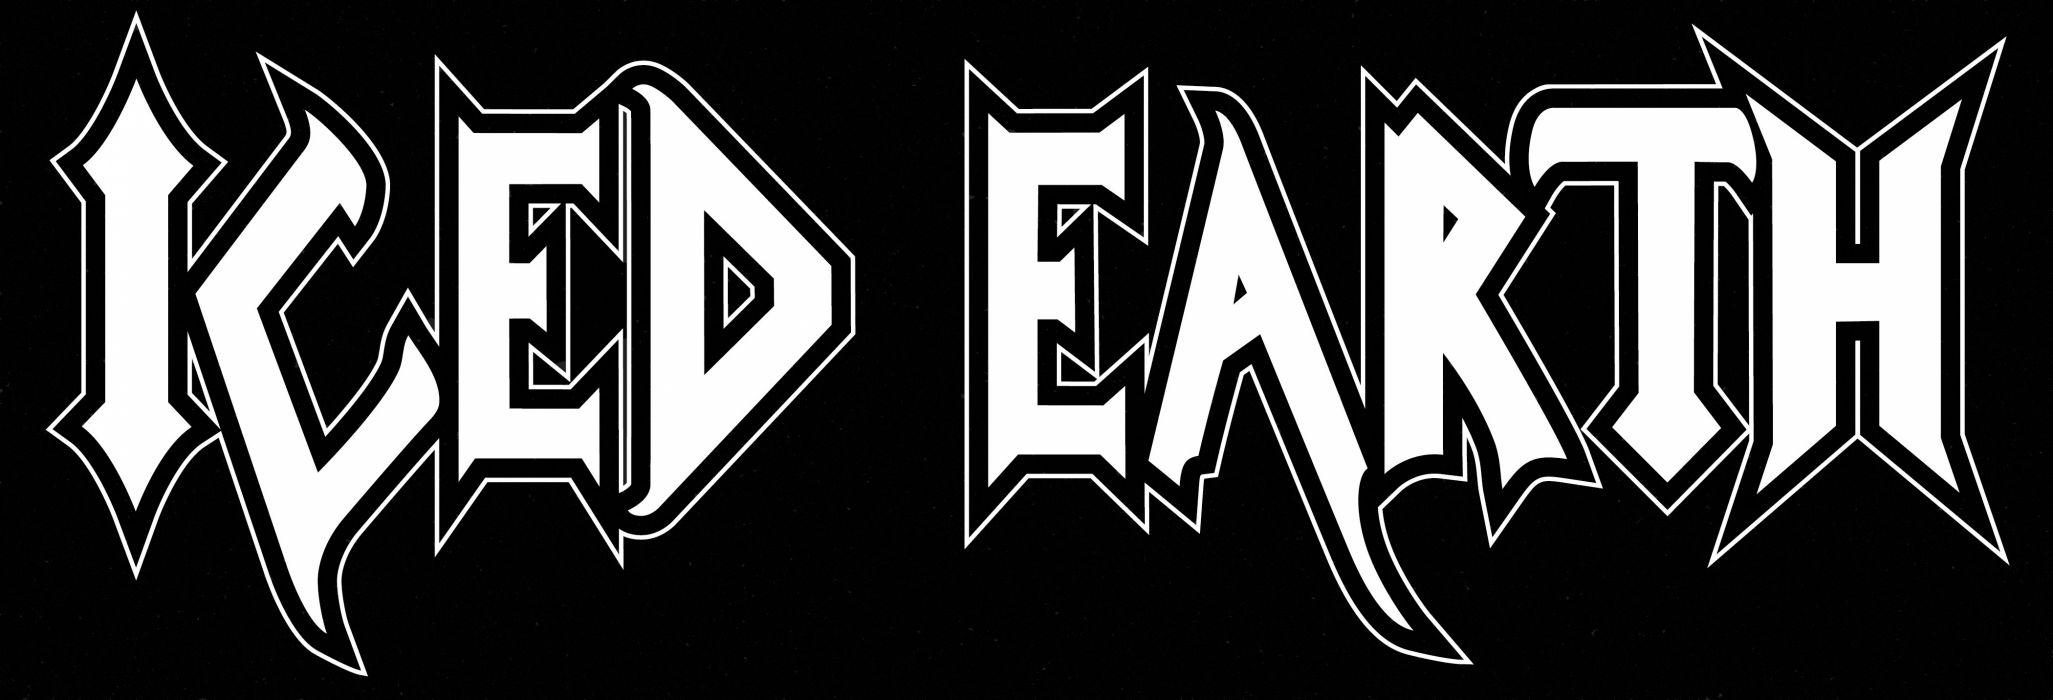 ICED EARTH heavy metal death power thrash 1iced poster wallpaper